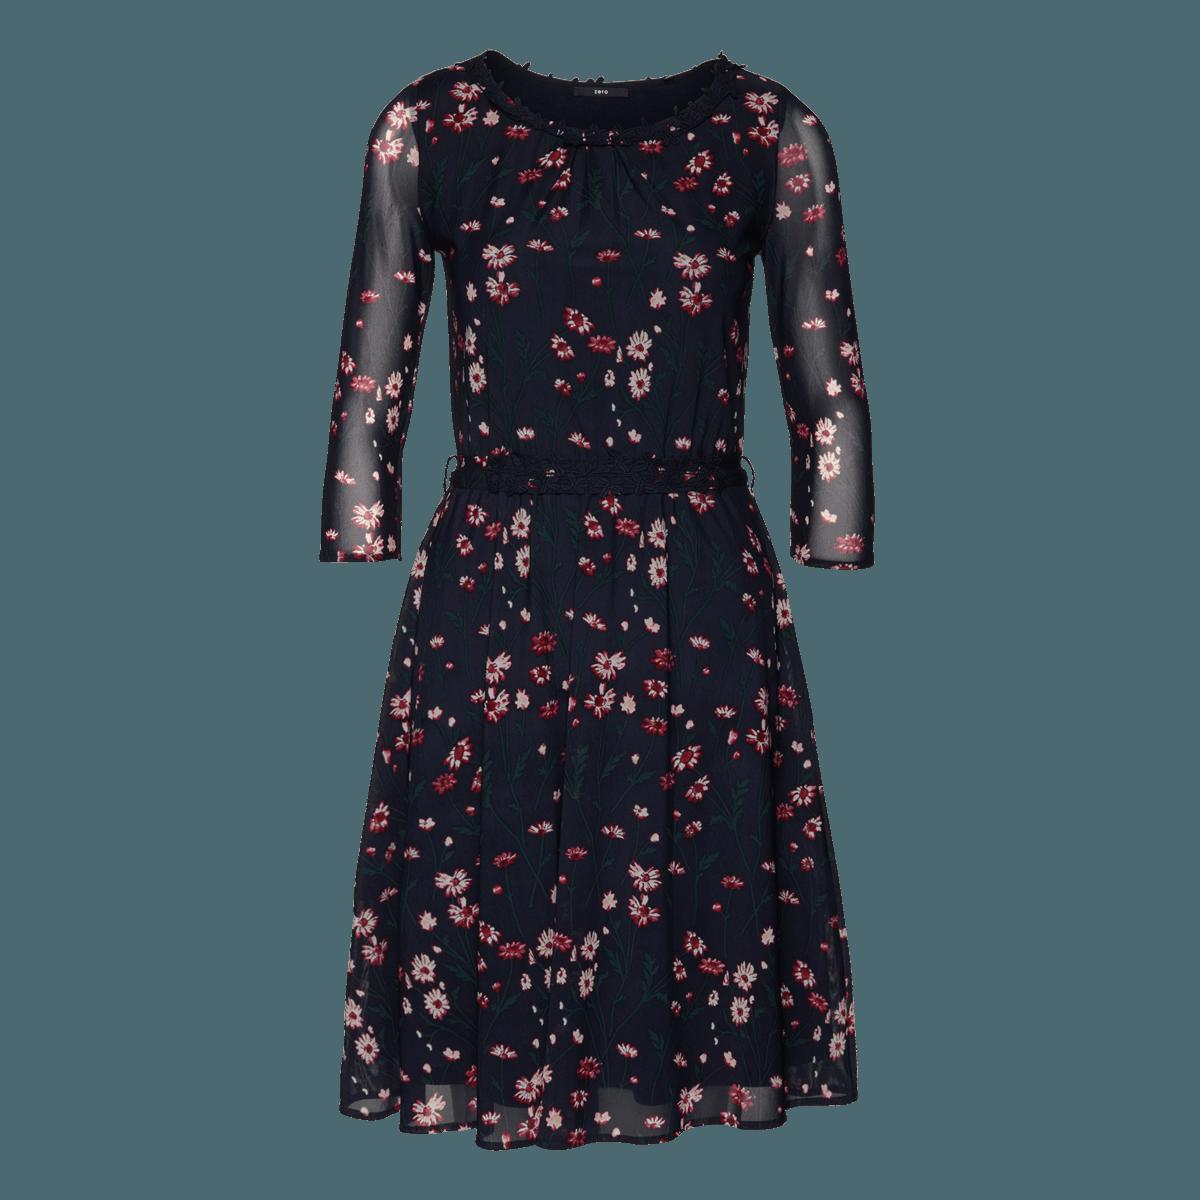 Mesh-Kleid mit Blumenprint in blue black